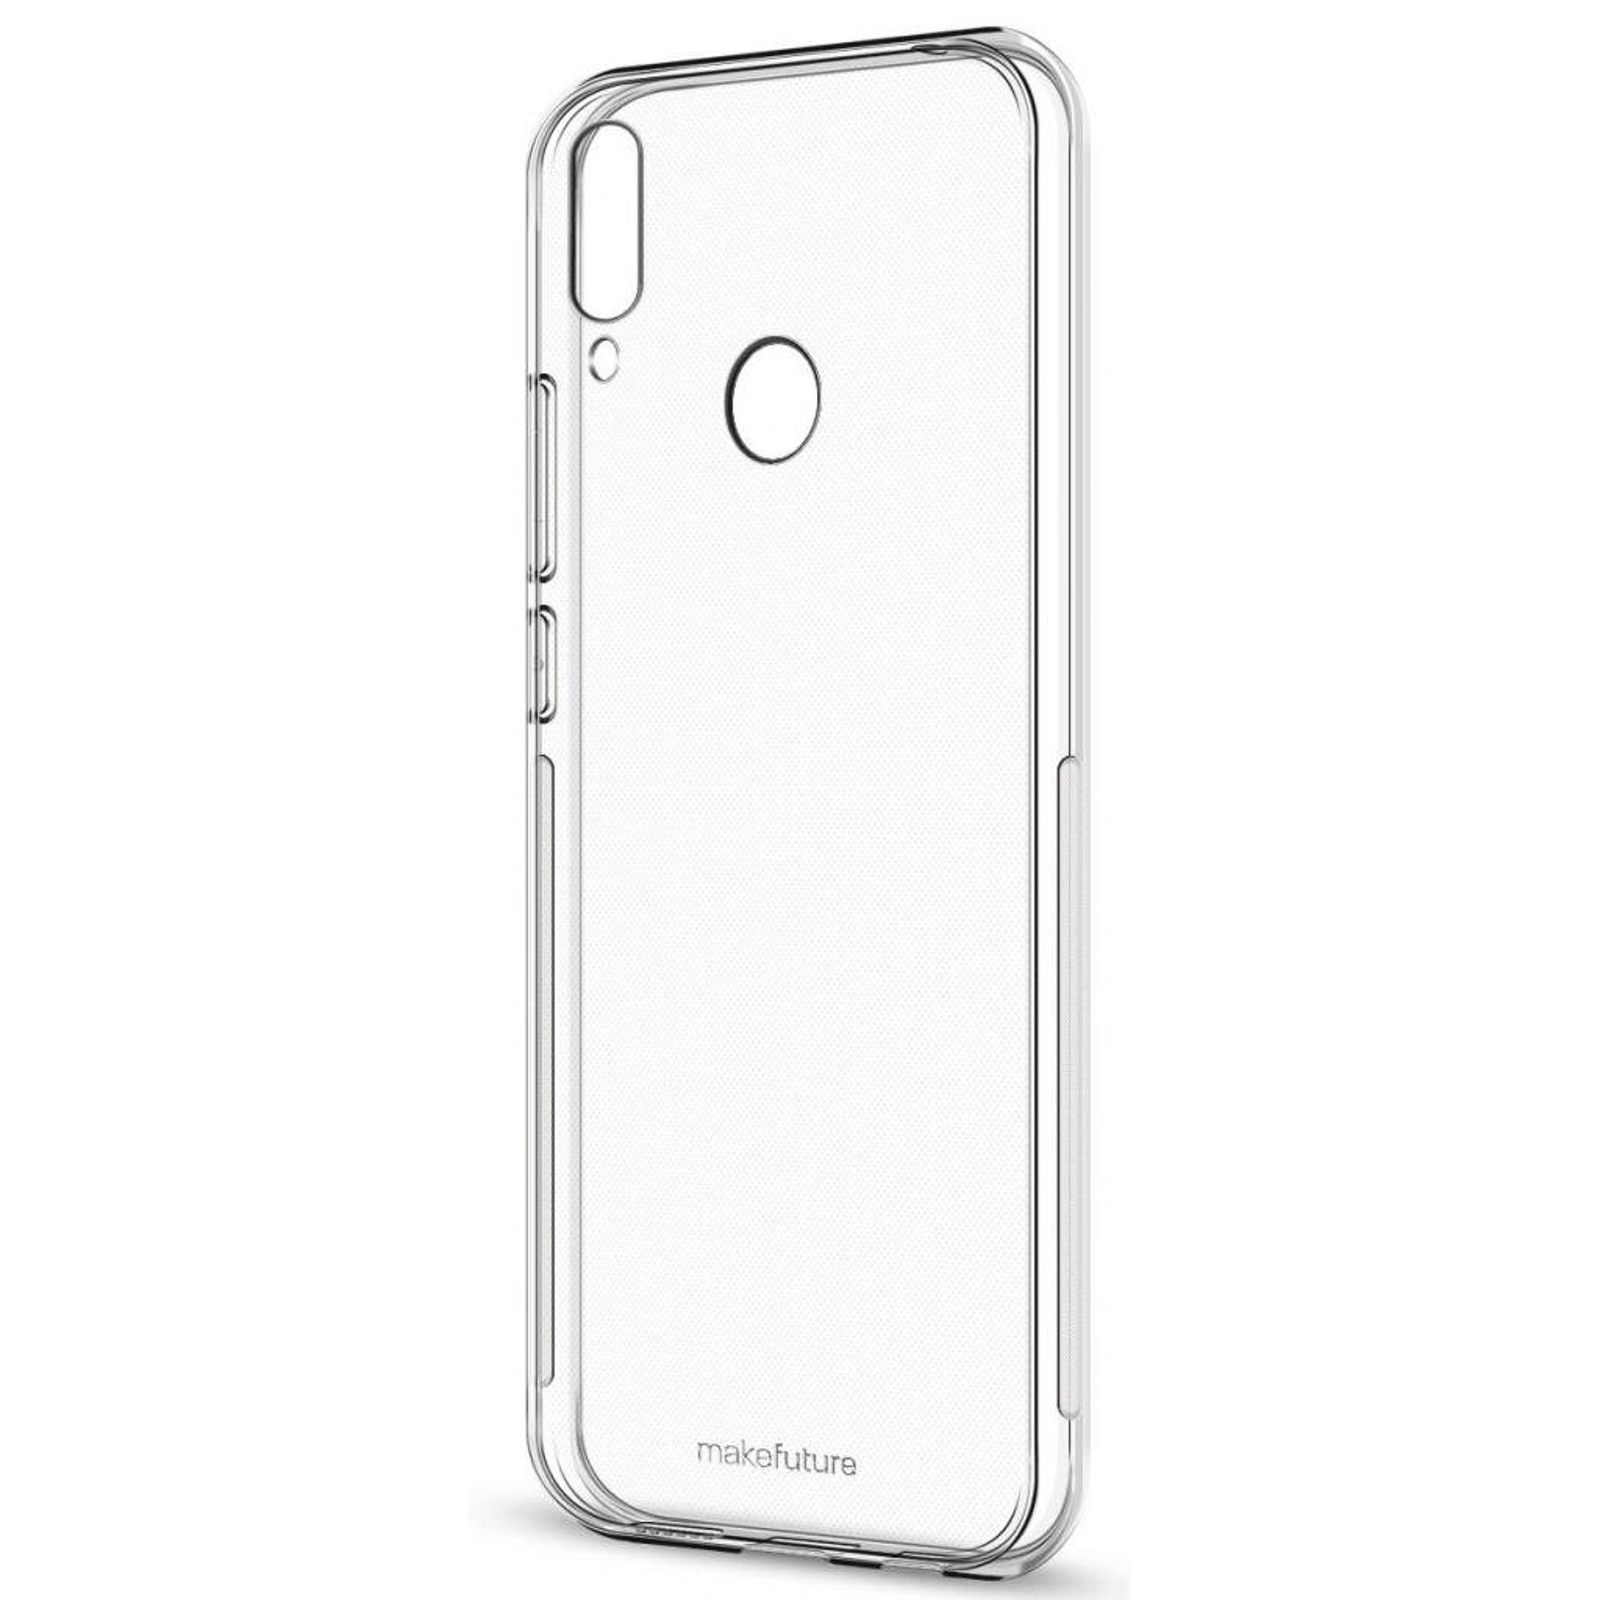 Чехол для моб. телефона MakeFuture Air Case (TPU) Huawei P Smart Plus Clear (MCA-HUPSPCL)